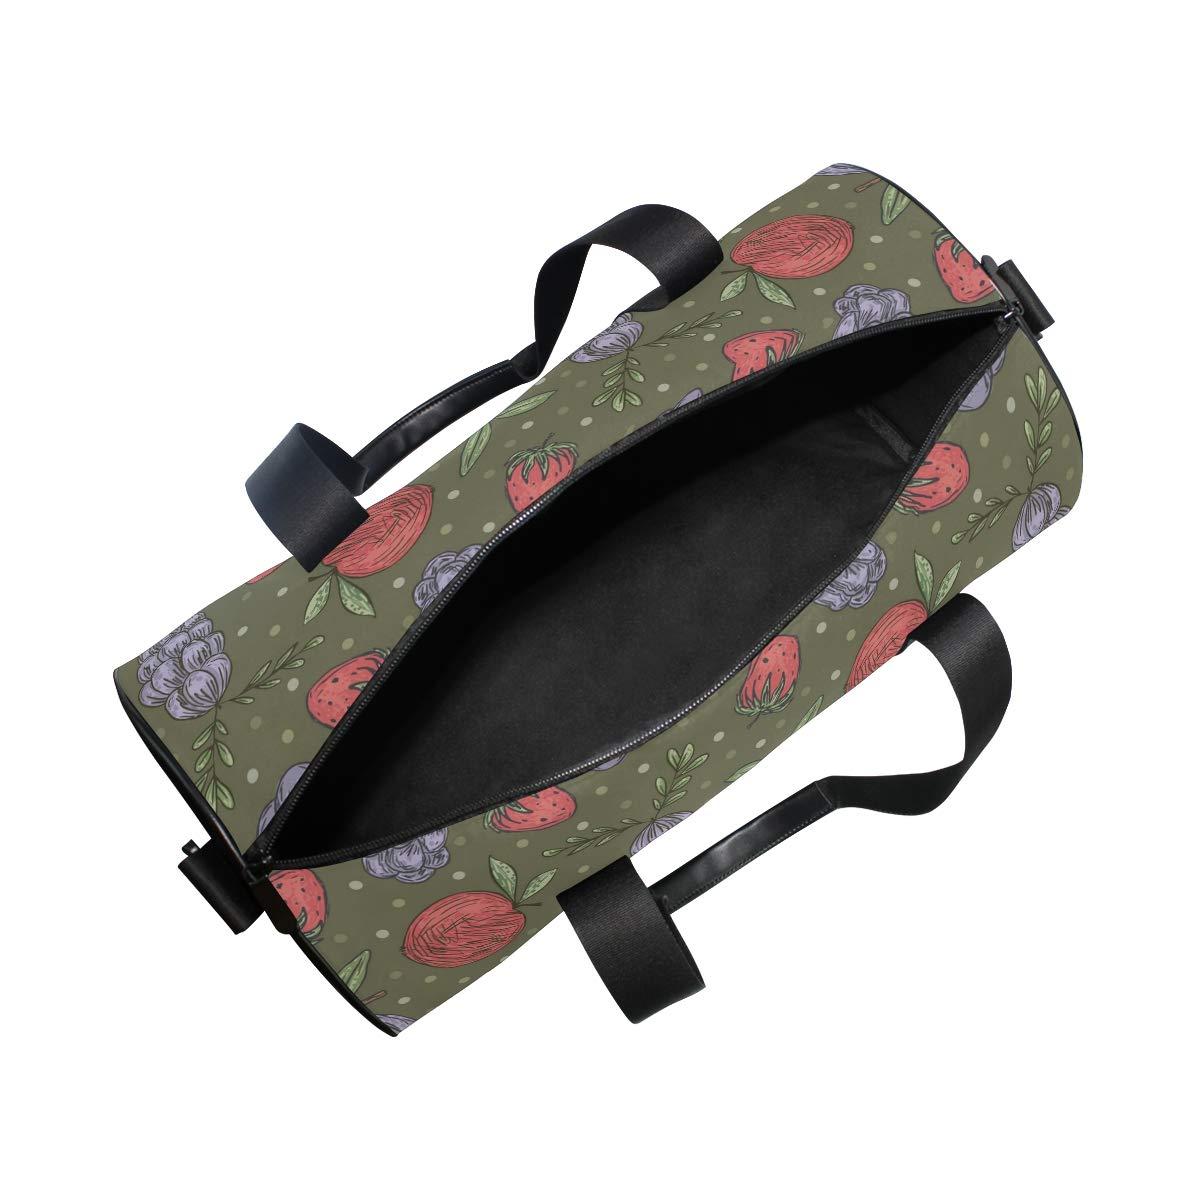 Waterproof Non-Slip Wearable Crossbody Bag fitness bag Shoulder Bag Peel Vegetables Picture